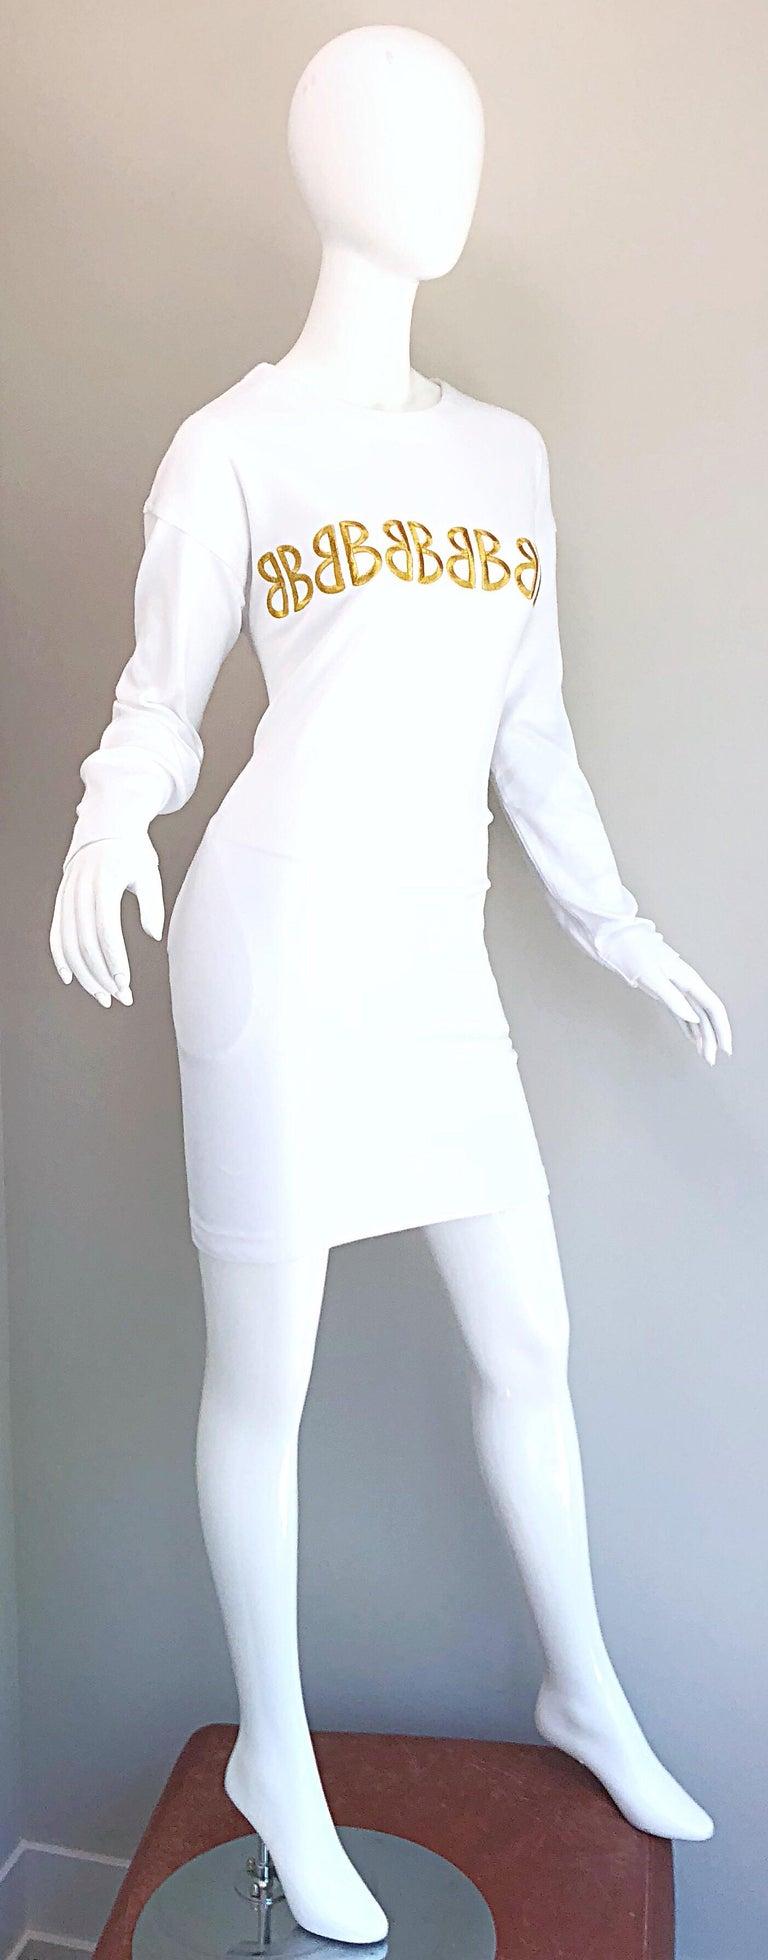 1990s Bill Blass Logo Mania White + Gold Vintage 90s Sweatshirt Dress Medium For Sale 9